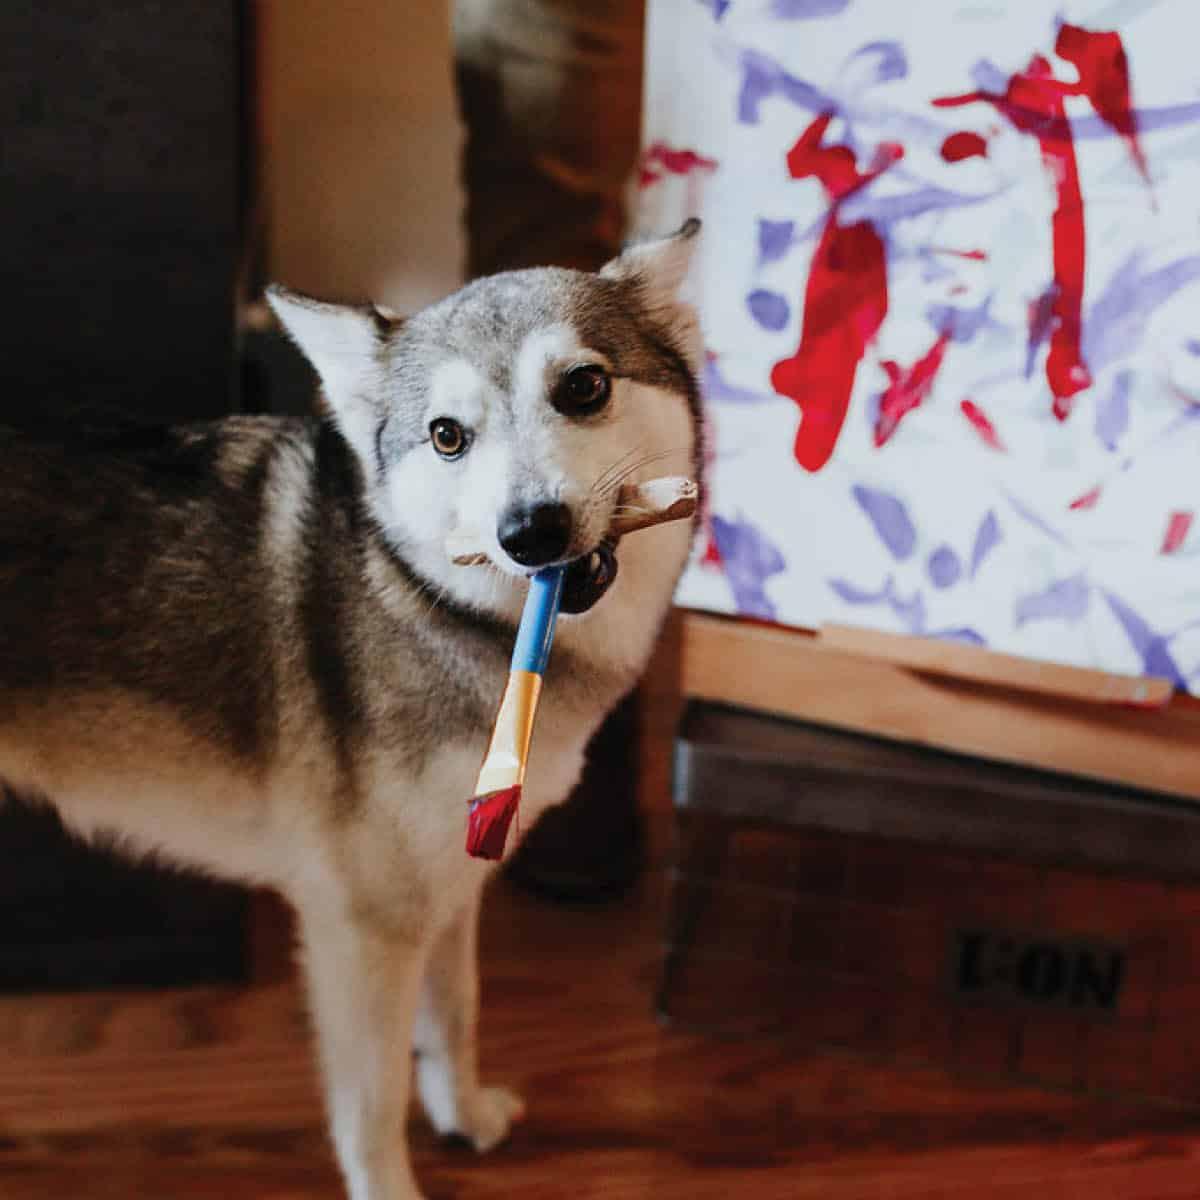 Sudo the dog paints a masterpiece